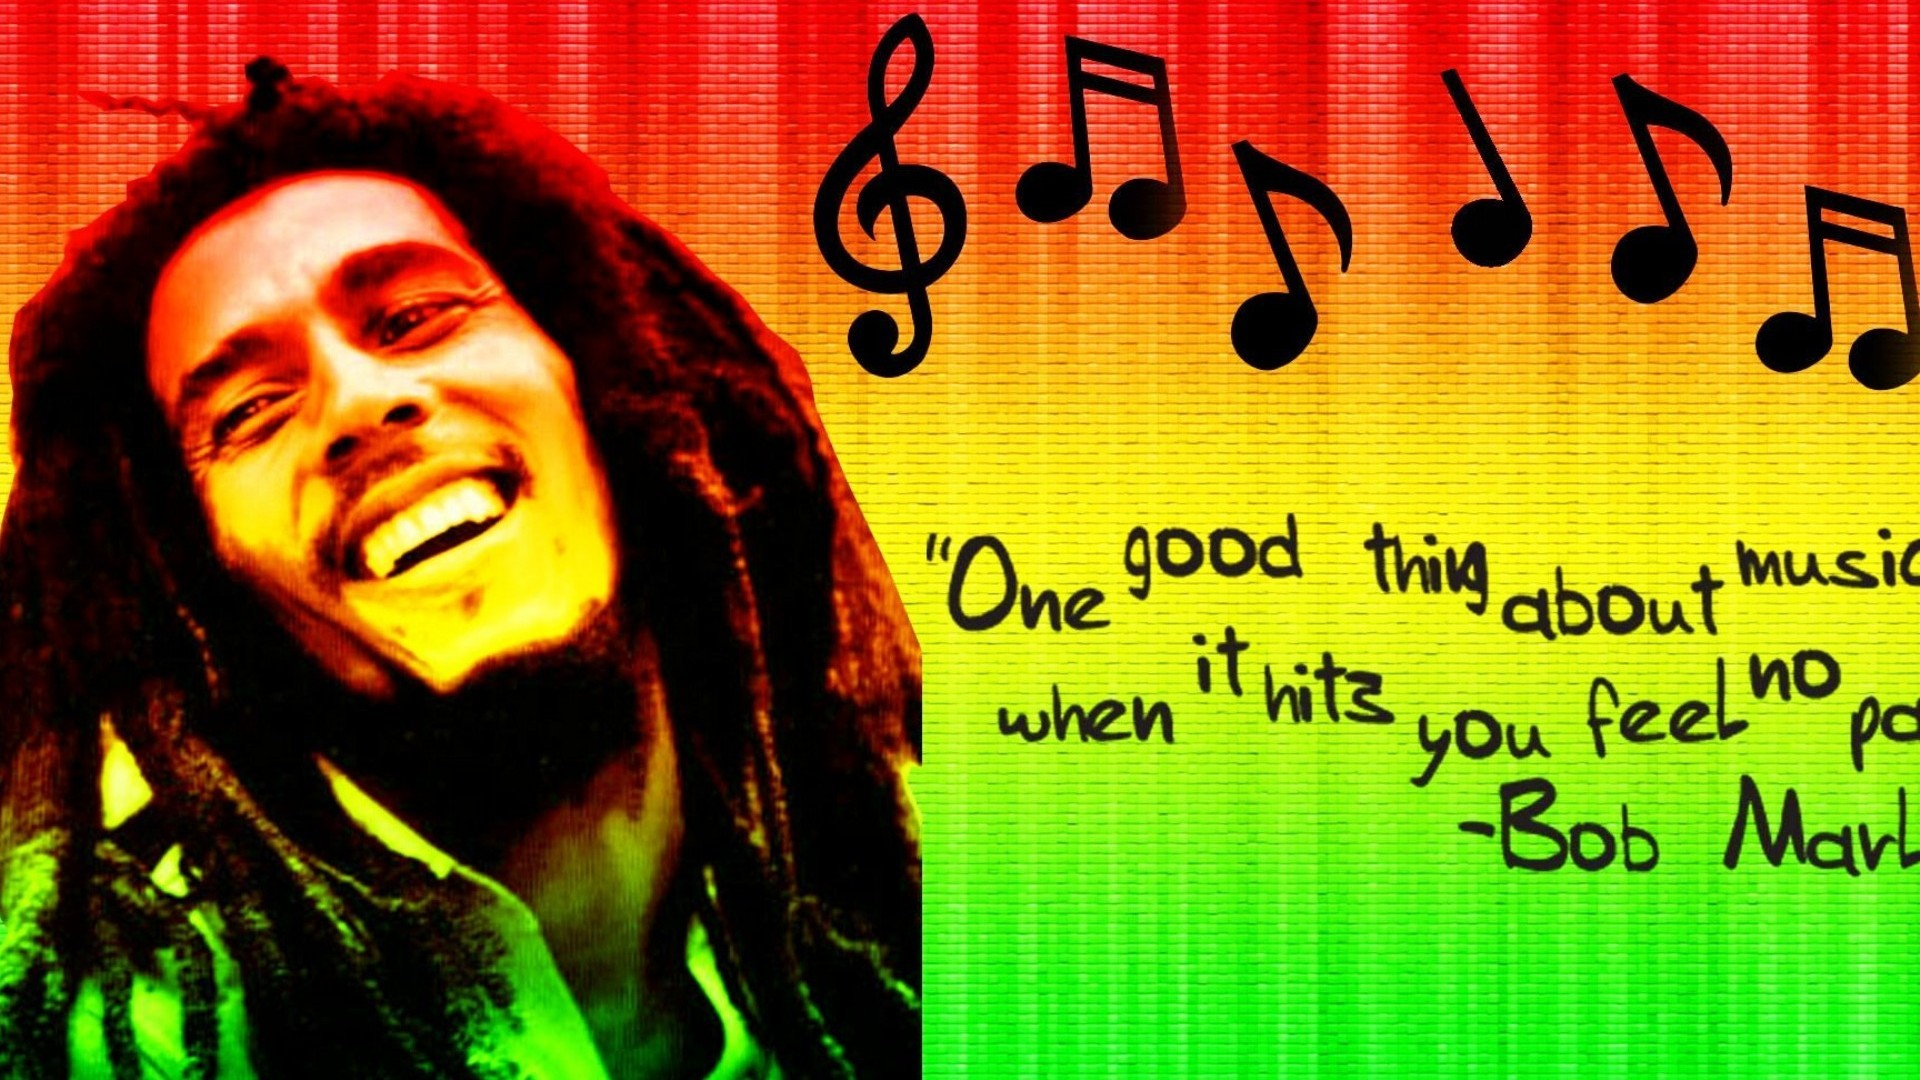 Bob Marley Quotes Iphone Wallpaper Labzada Wallpaper